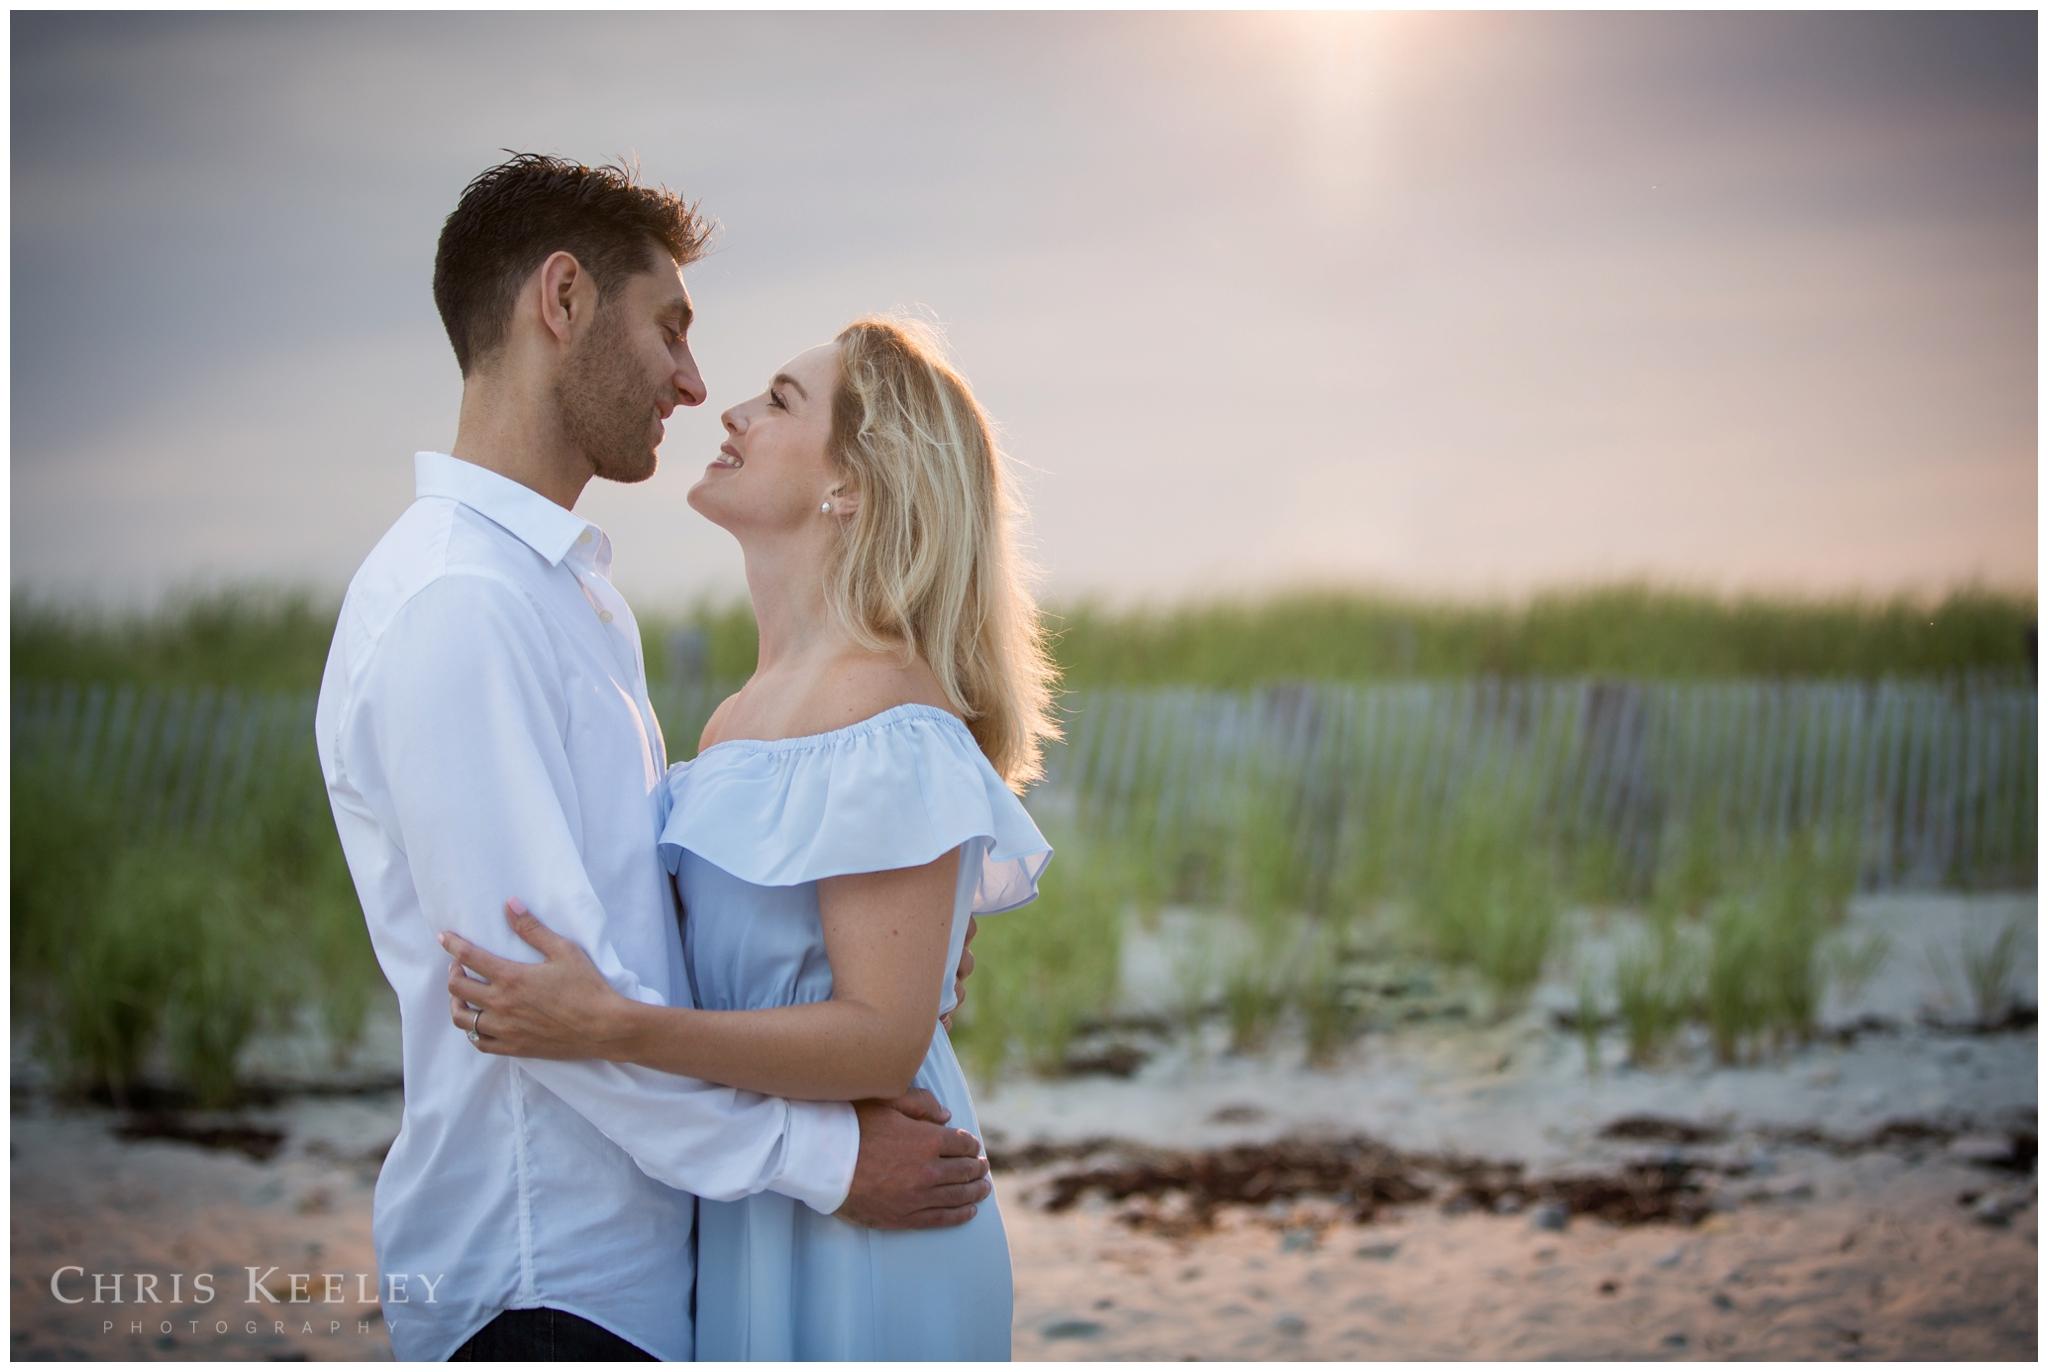 dover-new-hampshire-wedding-photographer-chris-keeley-photography-06.jpg